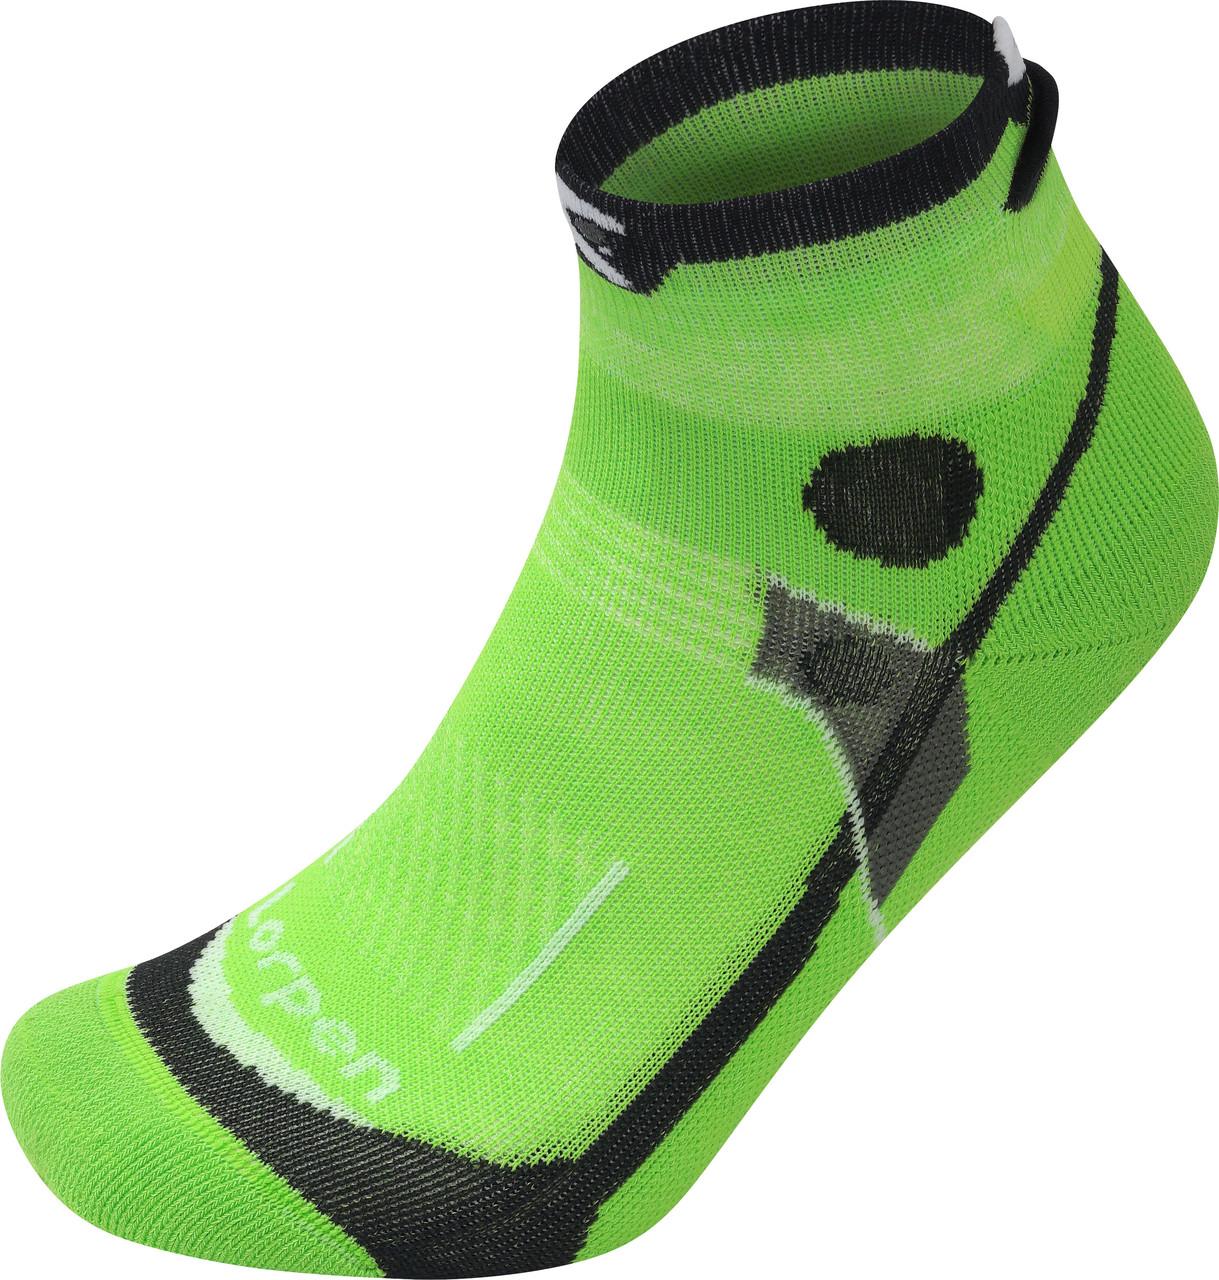 Шкарпетки Lorpen T3 Men's Ultra Trail Running Padded X3UTP17 Bright Green L (6210085 2238 L)